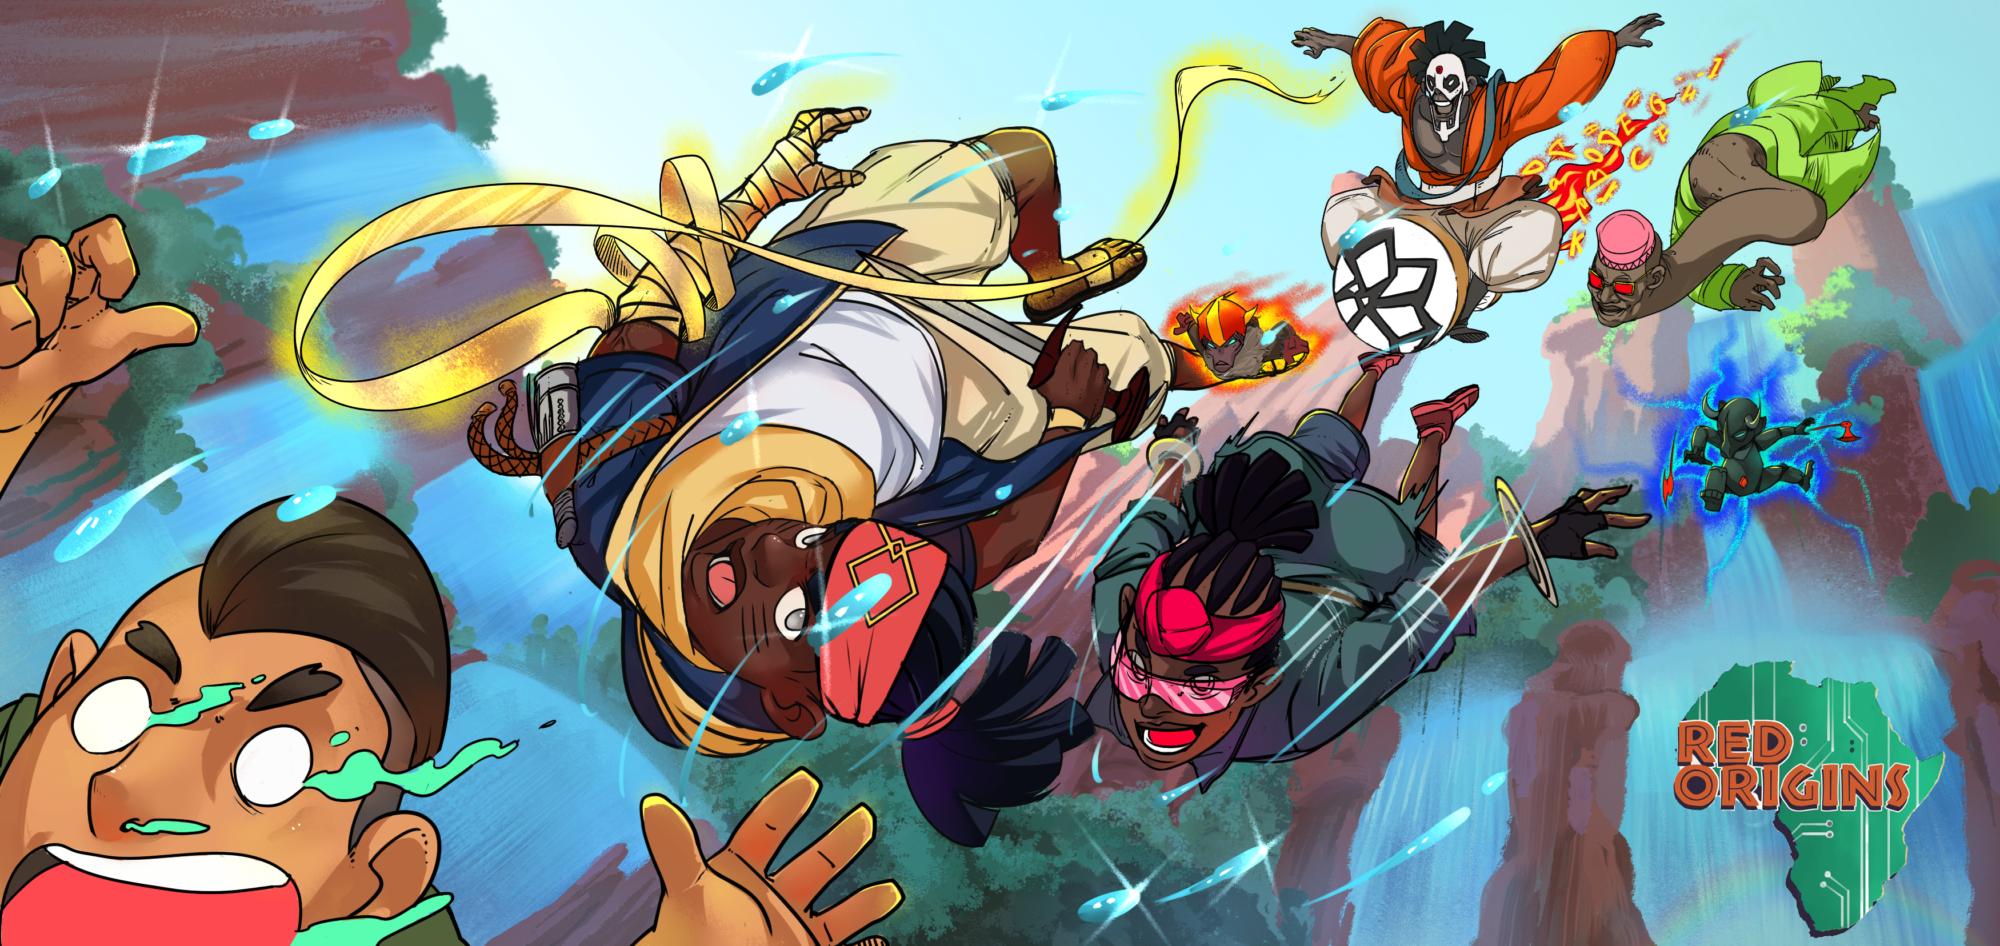 Red Origins comic book by Kolanut Productions